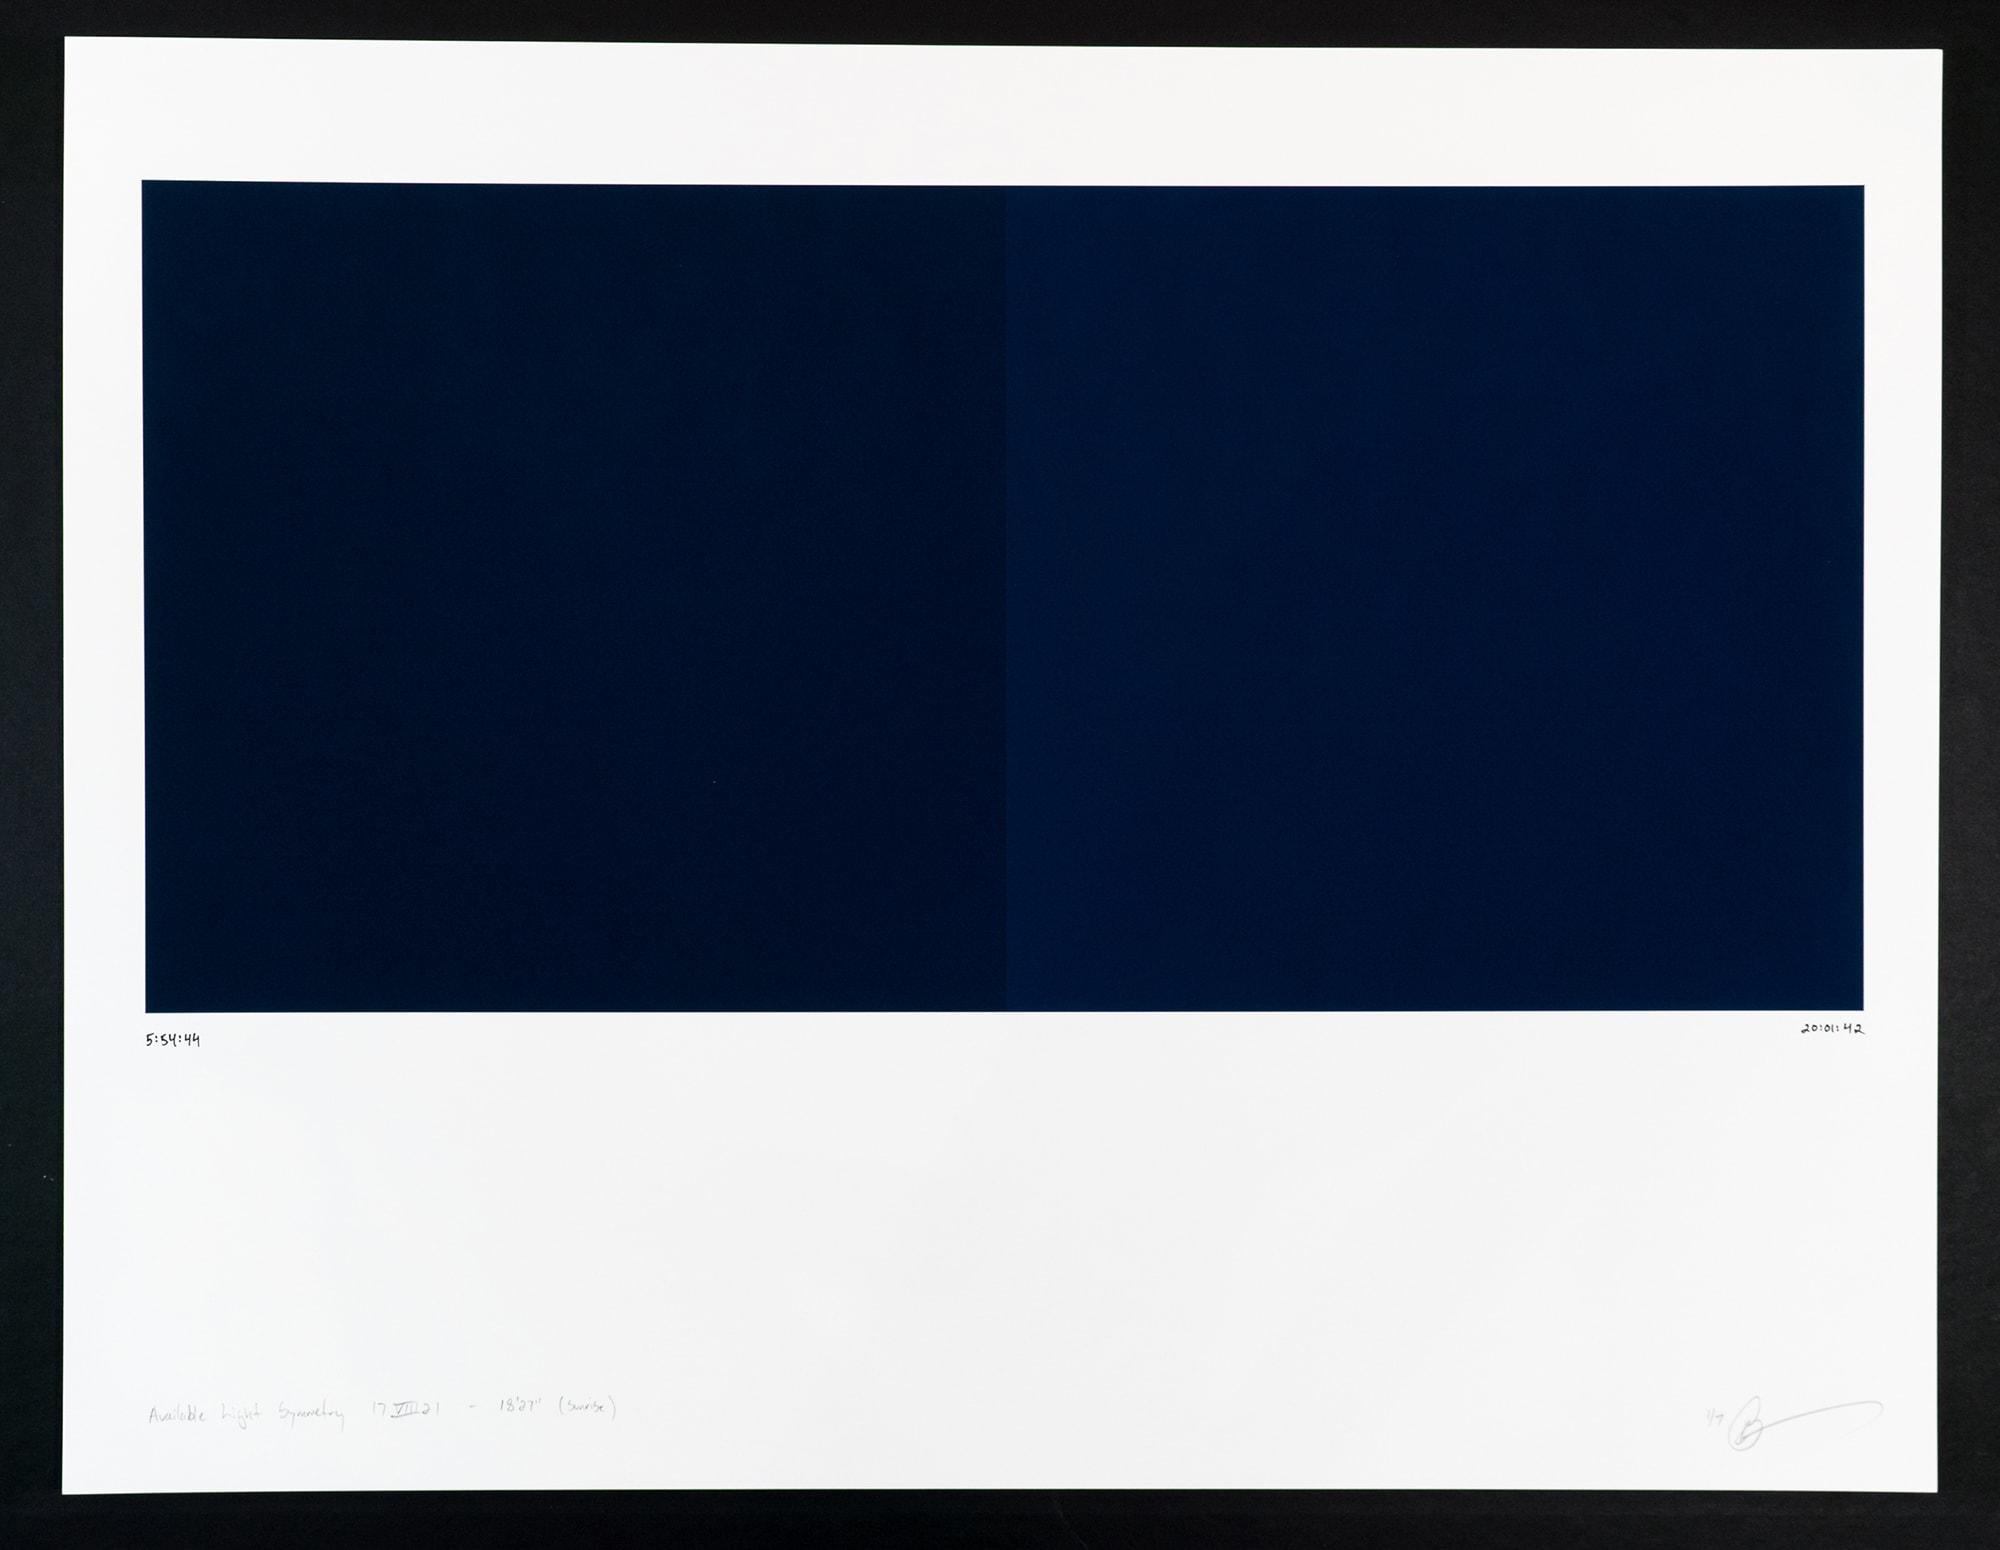 Randy Gibson : Available Light Symmetry 17VIII21 - 18'27″ (Sunrise)